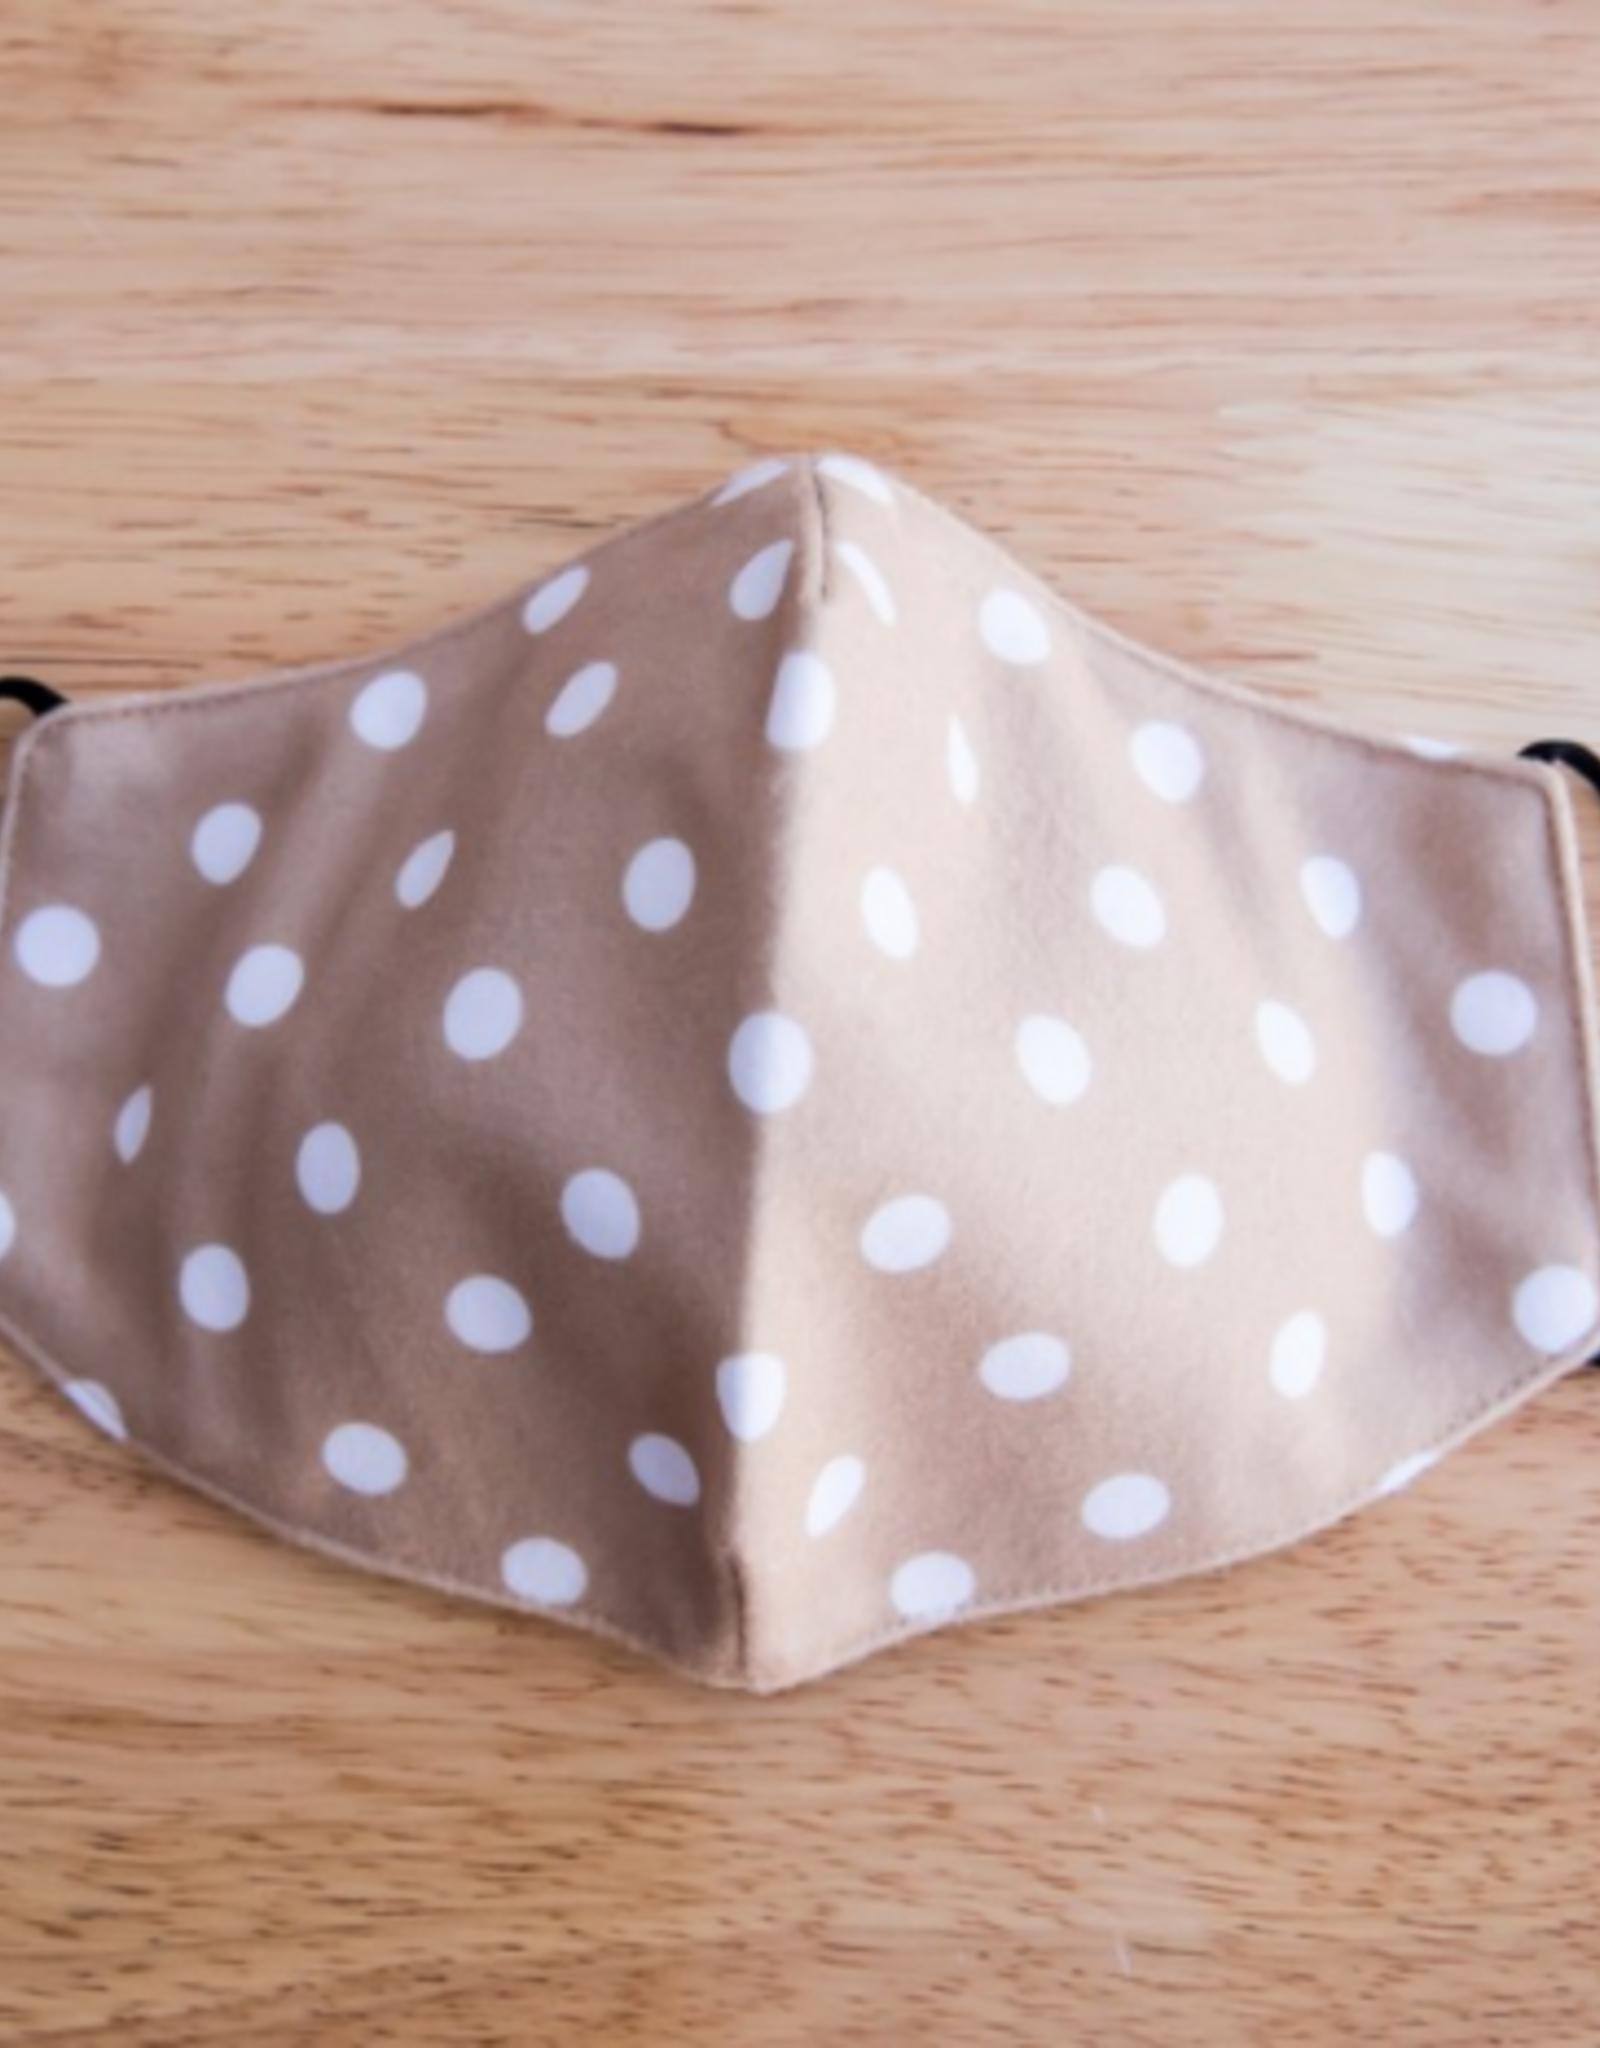 Residents-on Fashionable Mask WithAdjustable straps & Filter Pocket